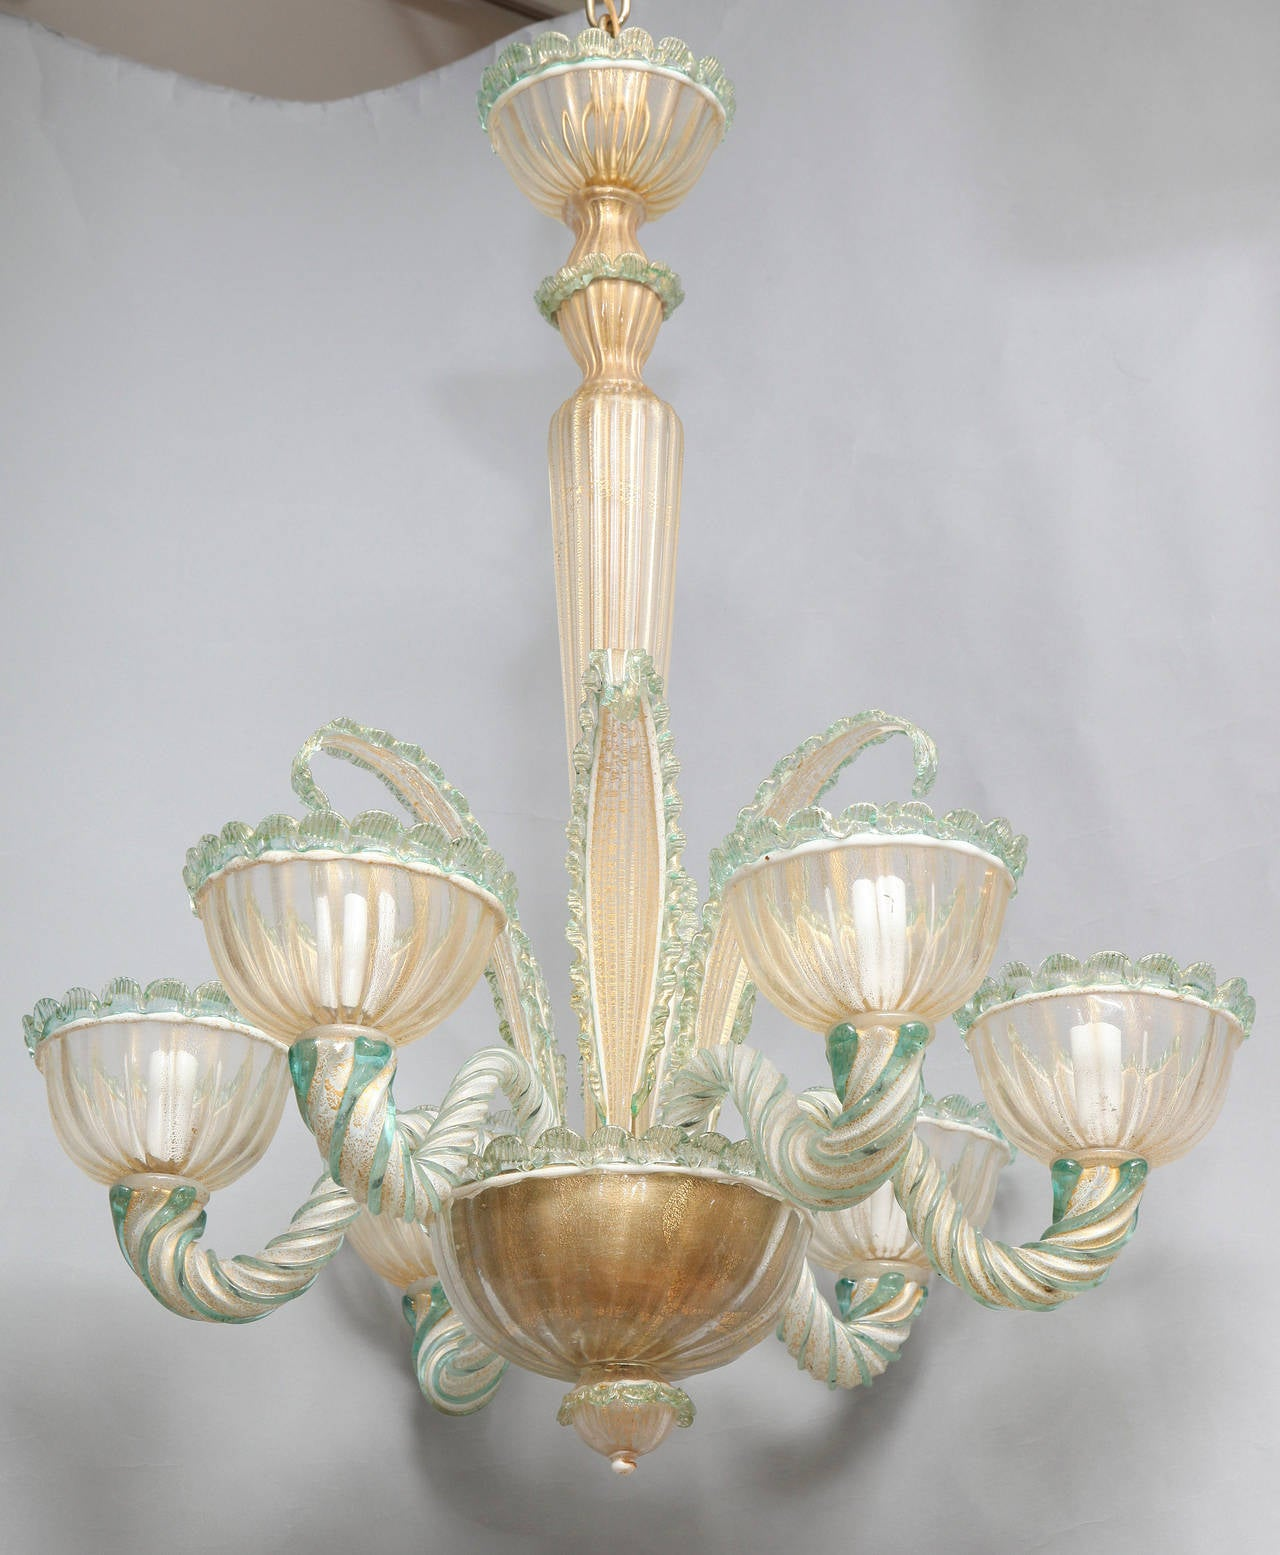 Murano Venetian Crystal Chandelier: Six-Light, Venetian Murano Glass Chandelier At 1stdibs